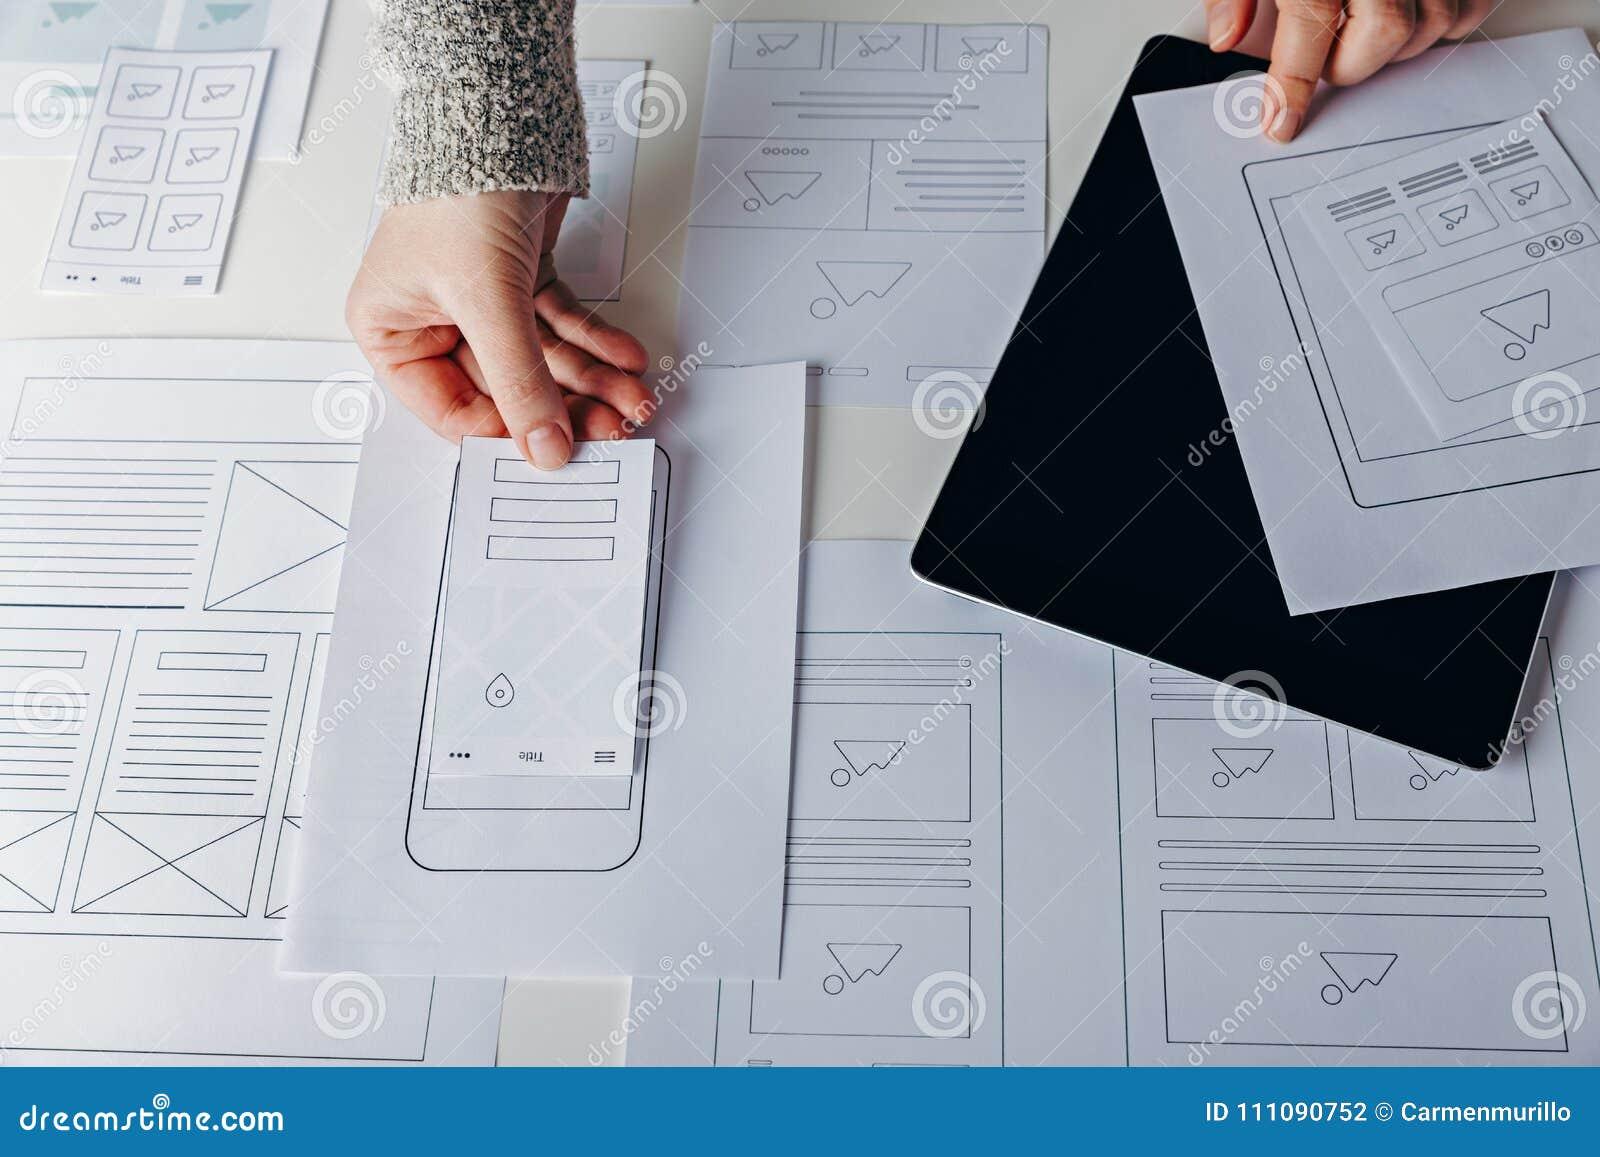 Web designer creating mobile responsive website